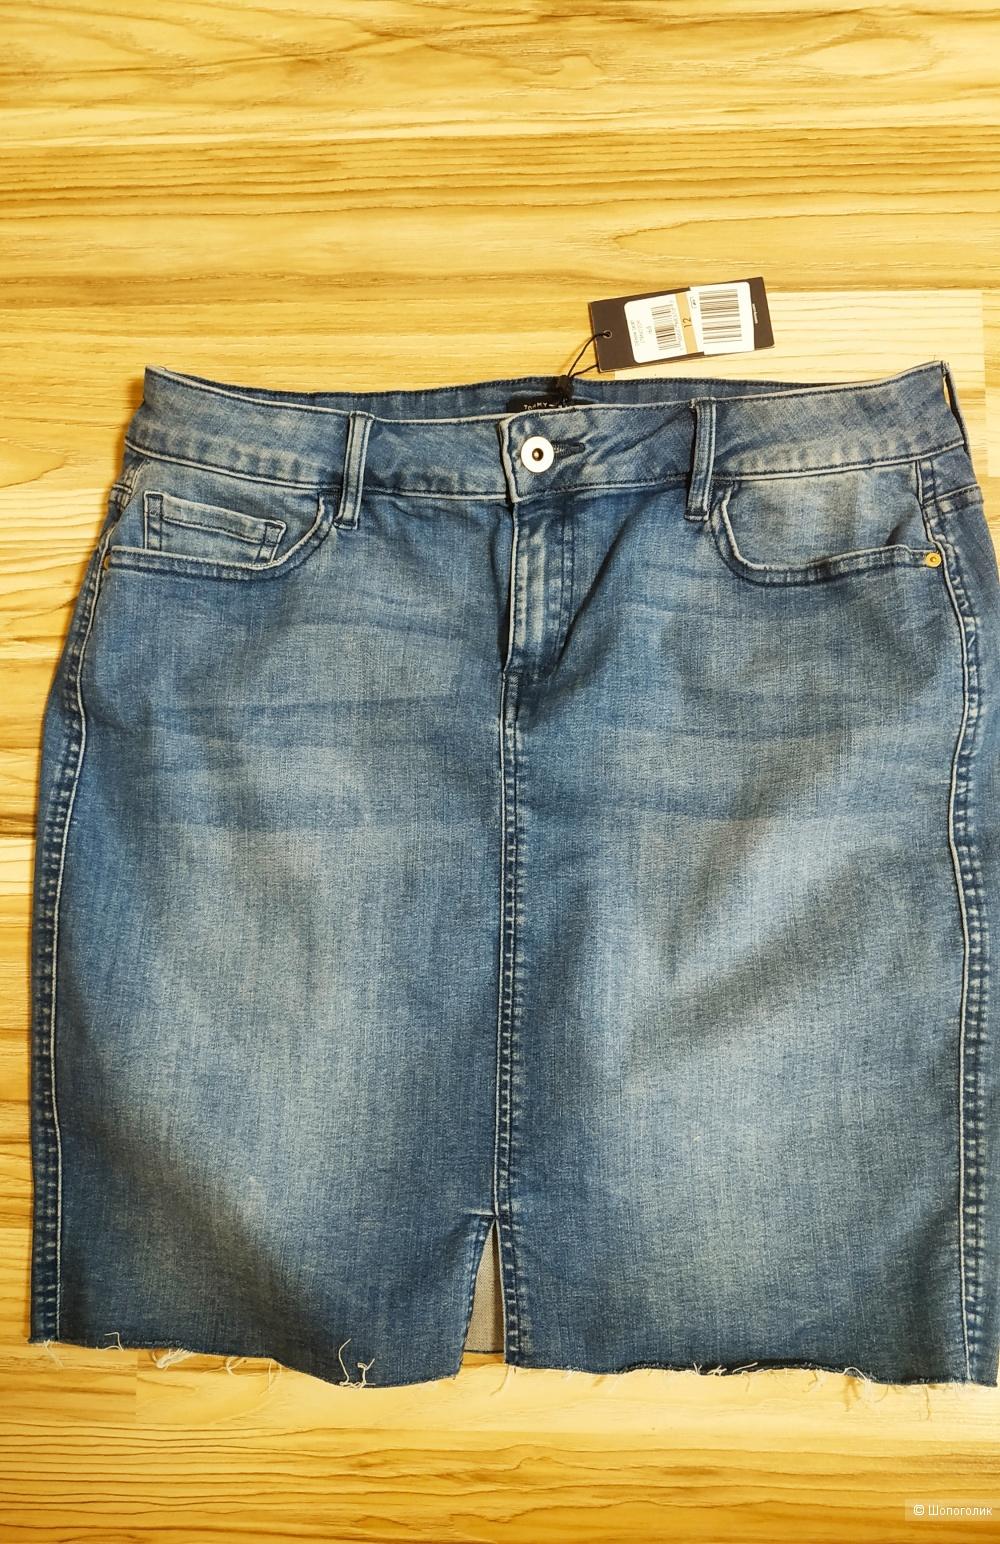 Юбка джинсовая от Tommy Hilfiger, размер 12(М/L)